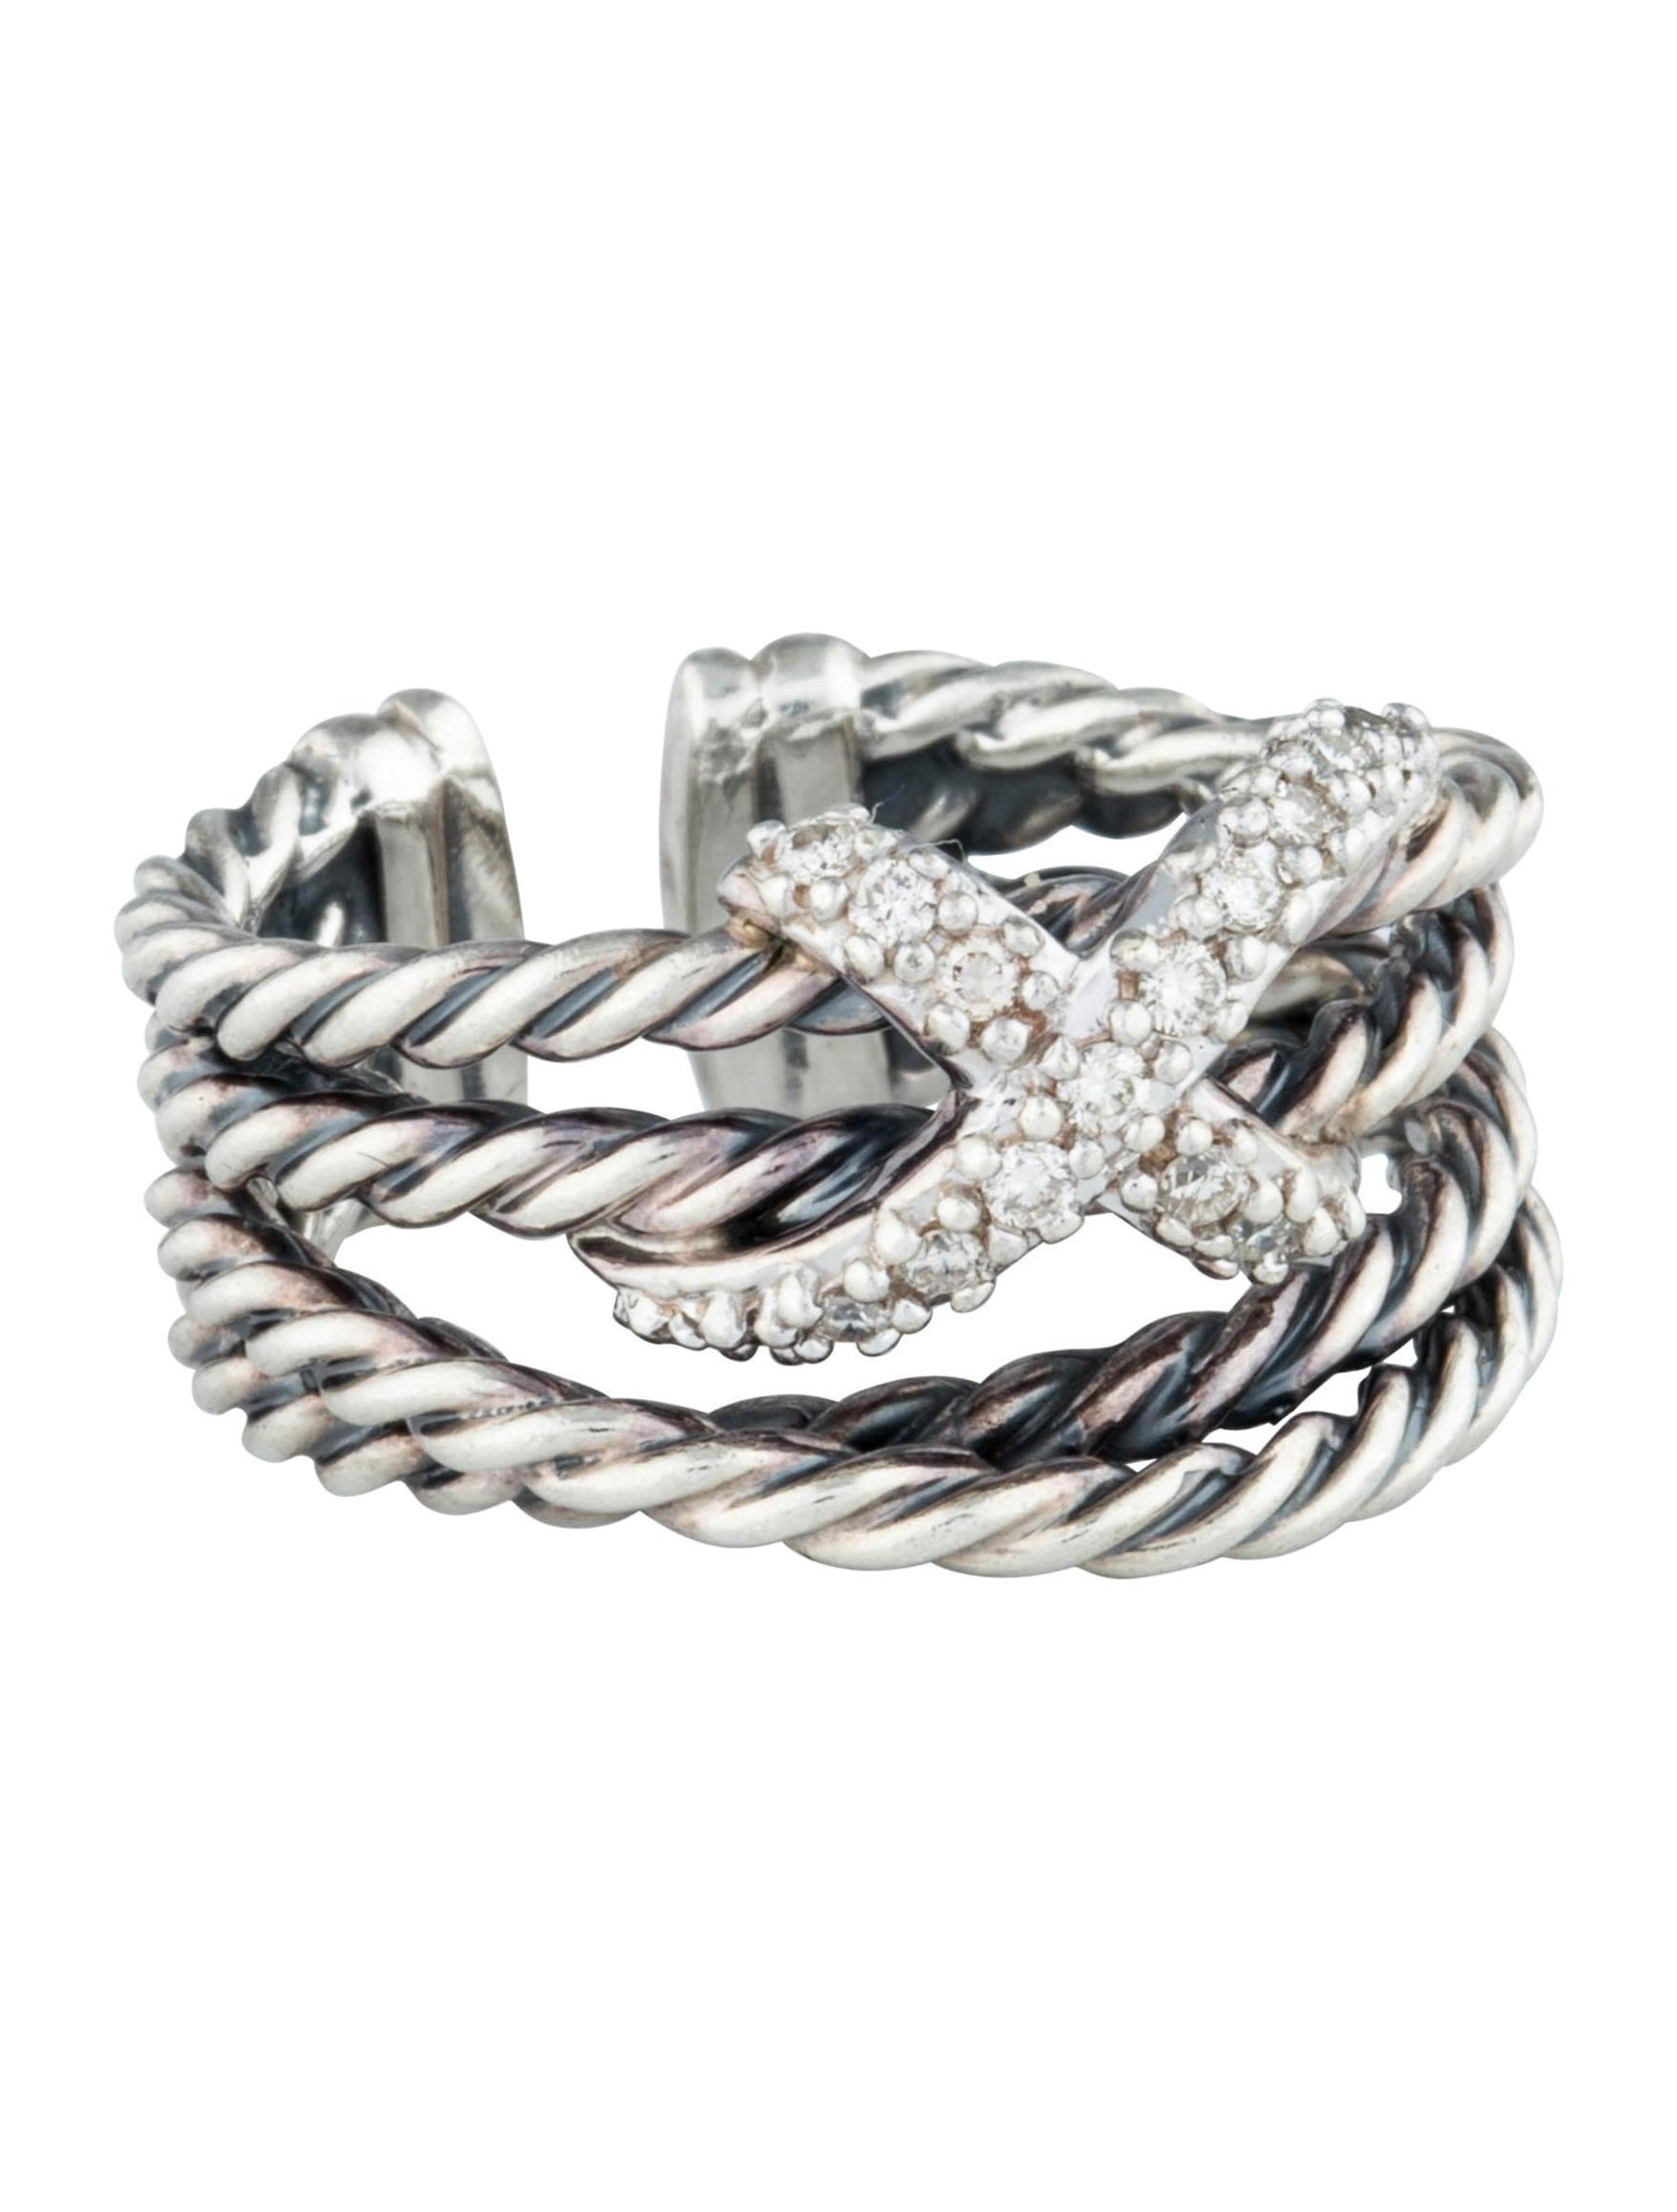 david yurman diamond x cable ring rings dvy25629 the. Black Bedroom Furniture Sets. Home Design Ideas